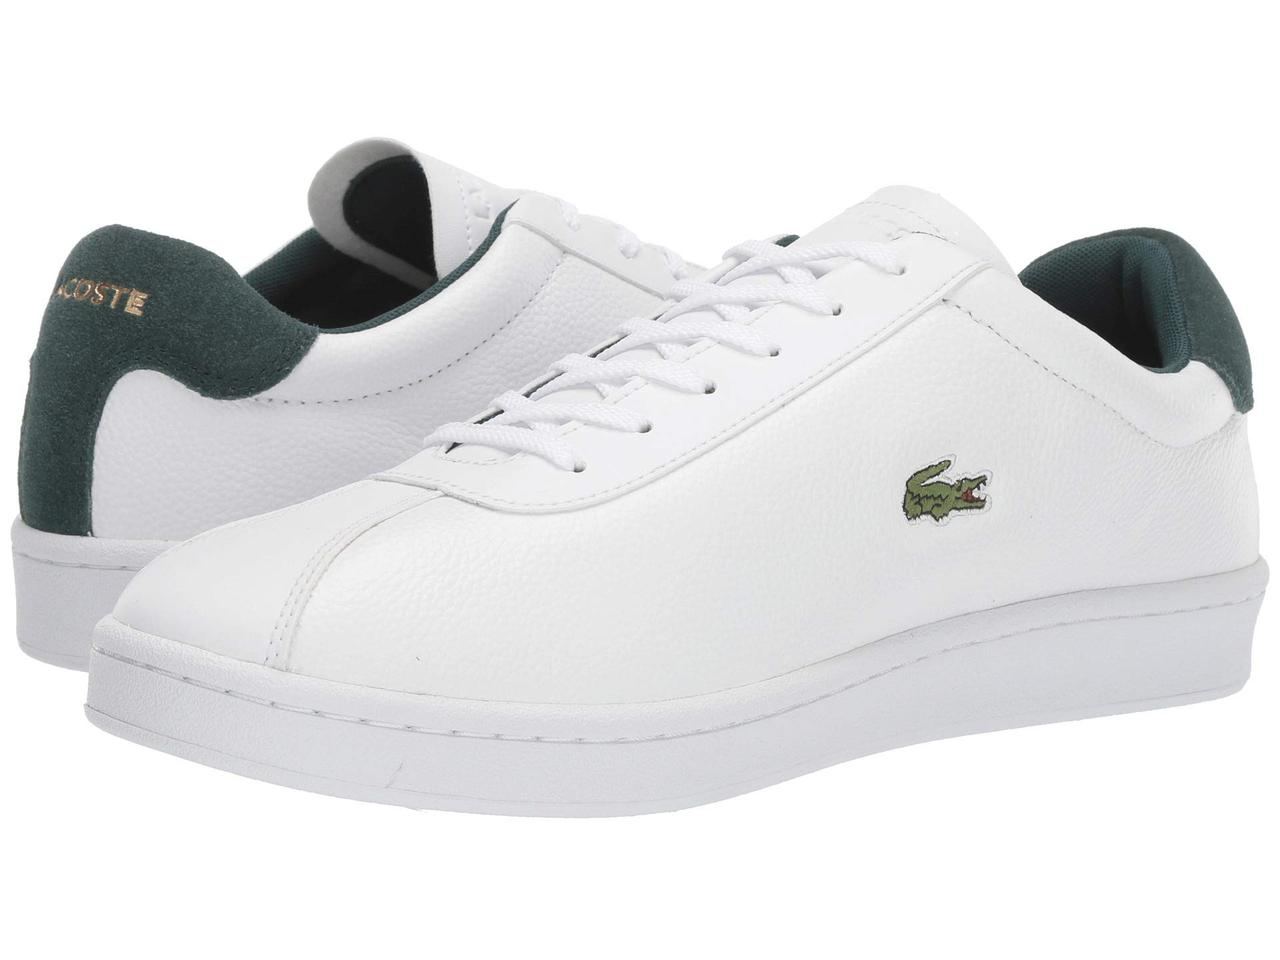 Кроссовки/Кеды (Оригинал) Lacoste Masters 319 1 White/Dark Green